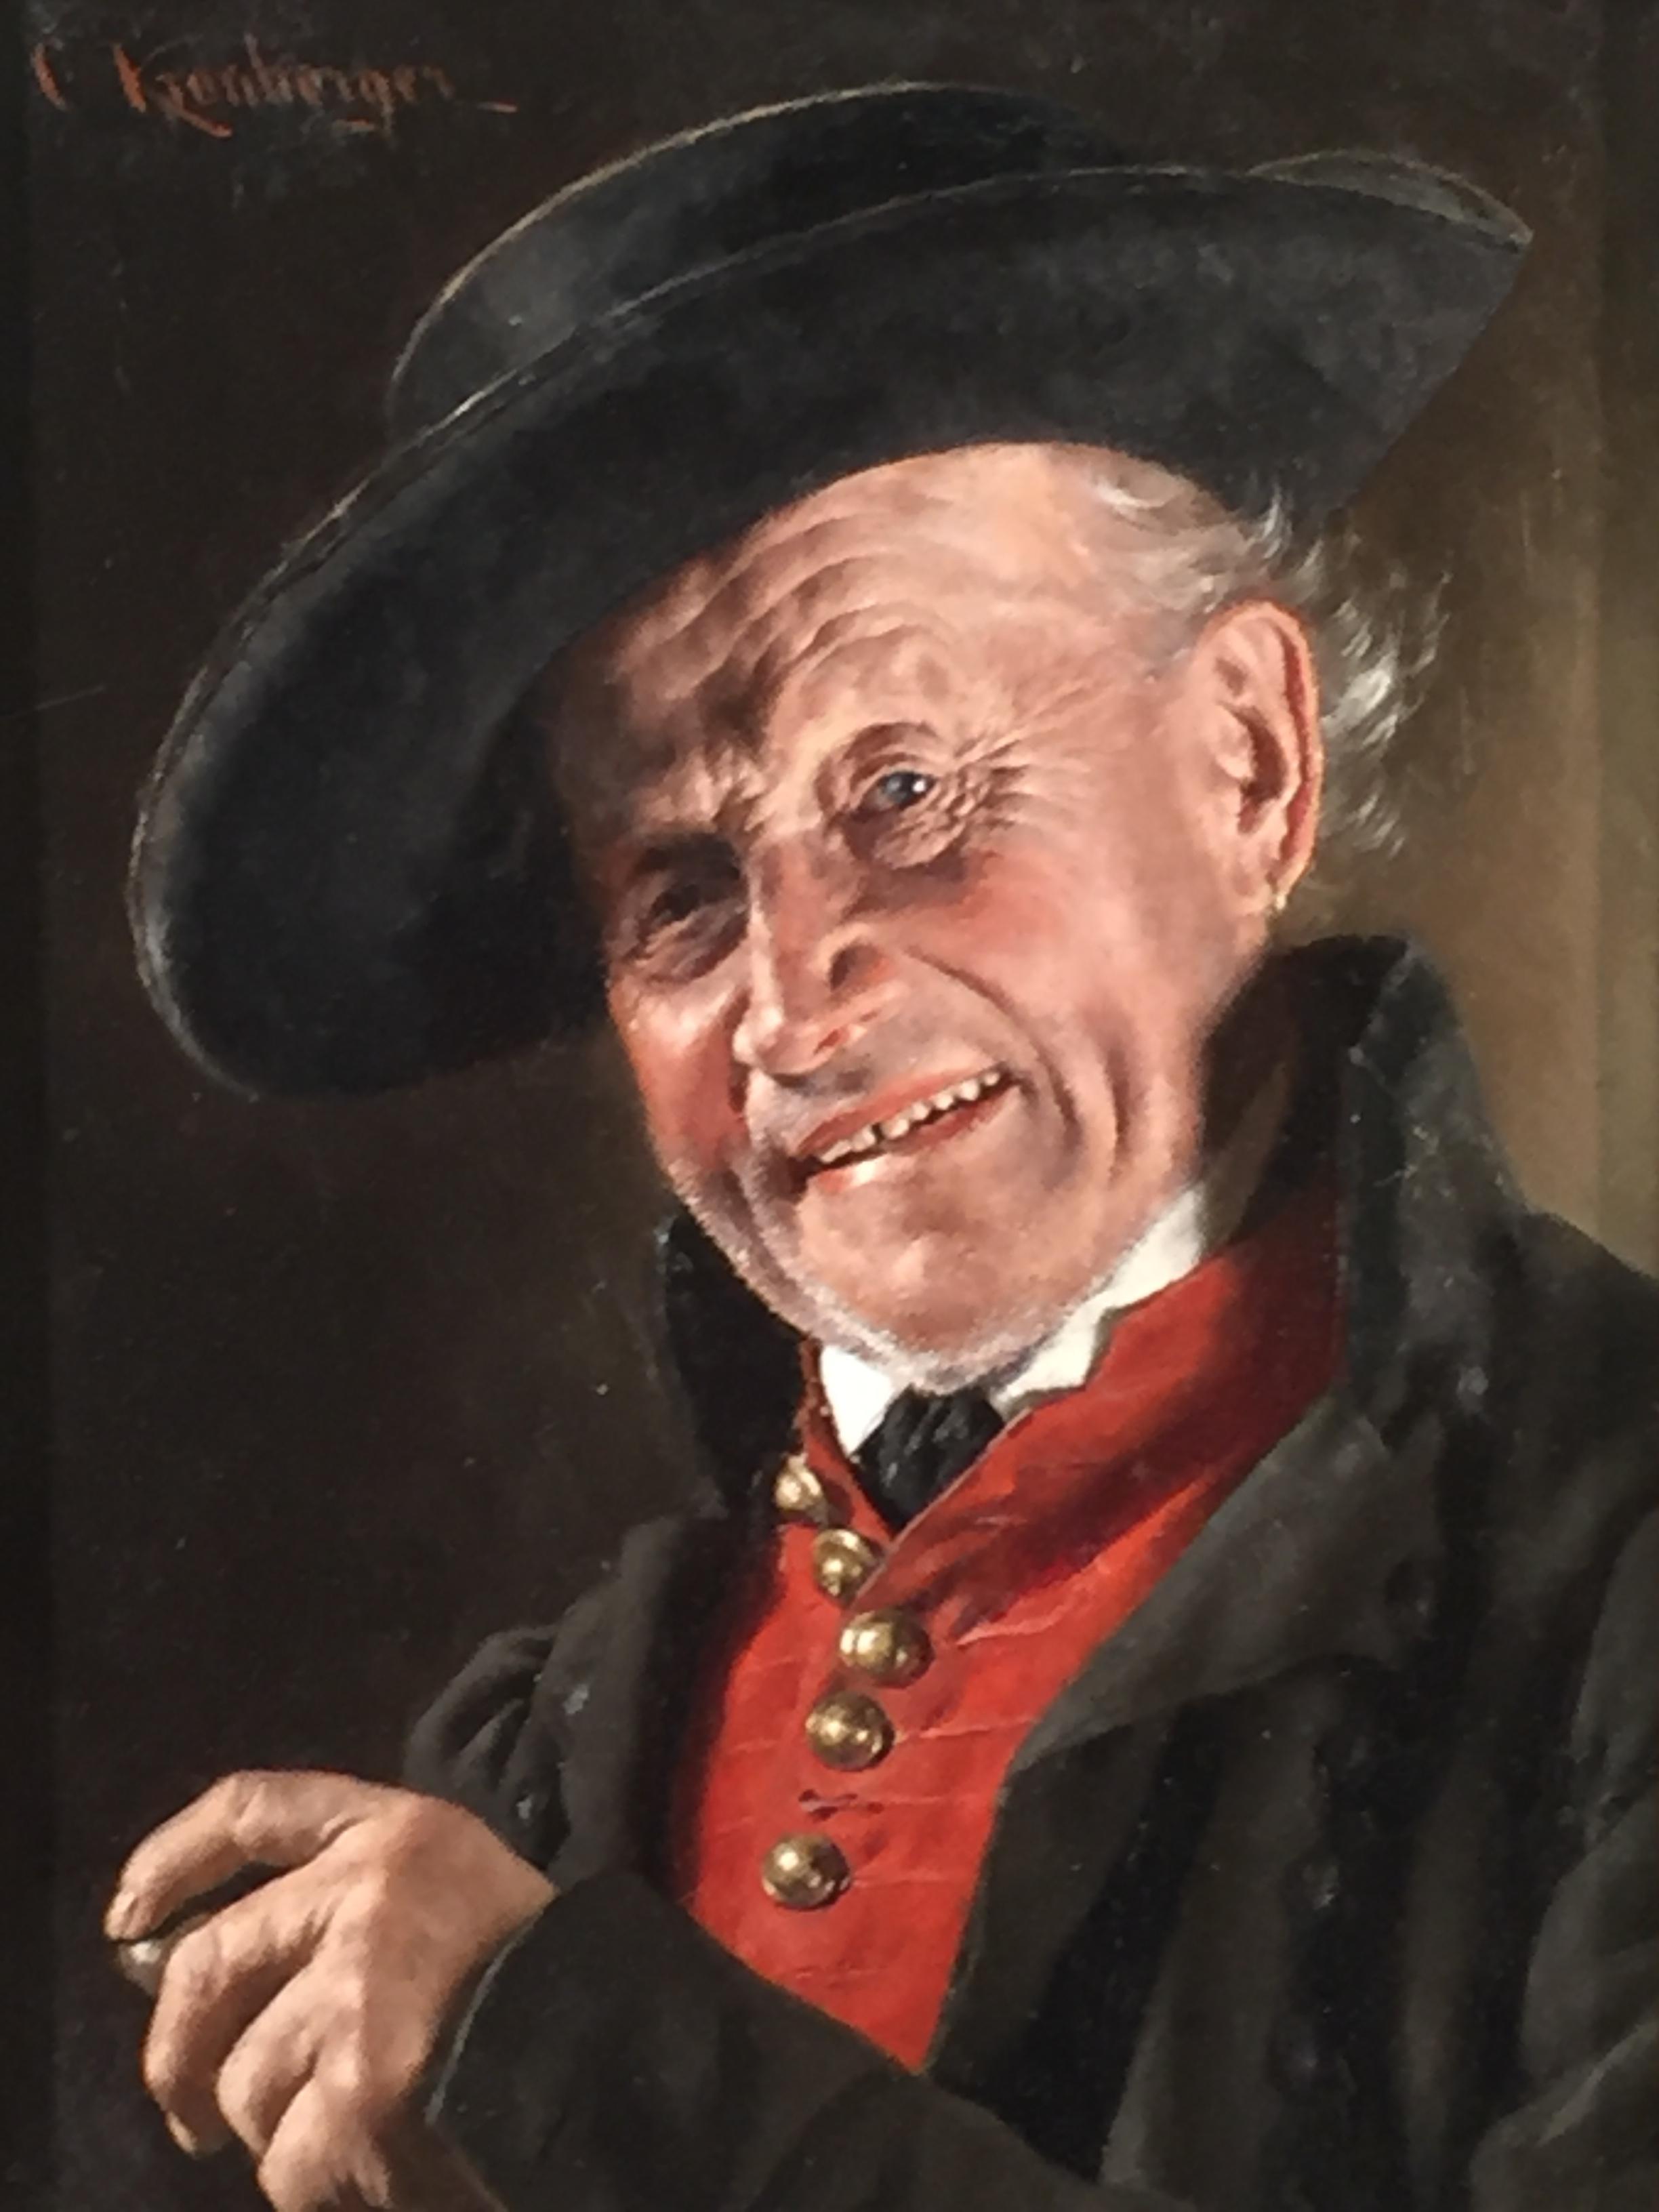 Carl Kronberger